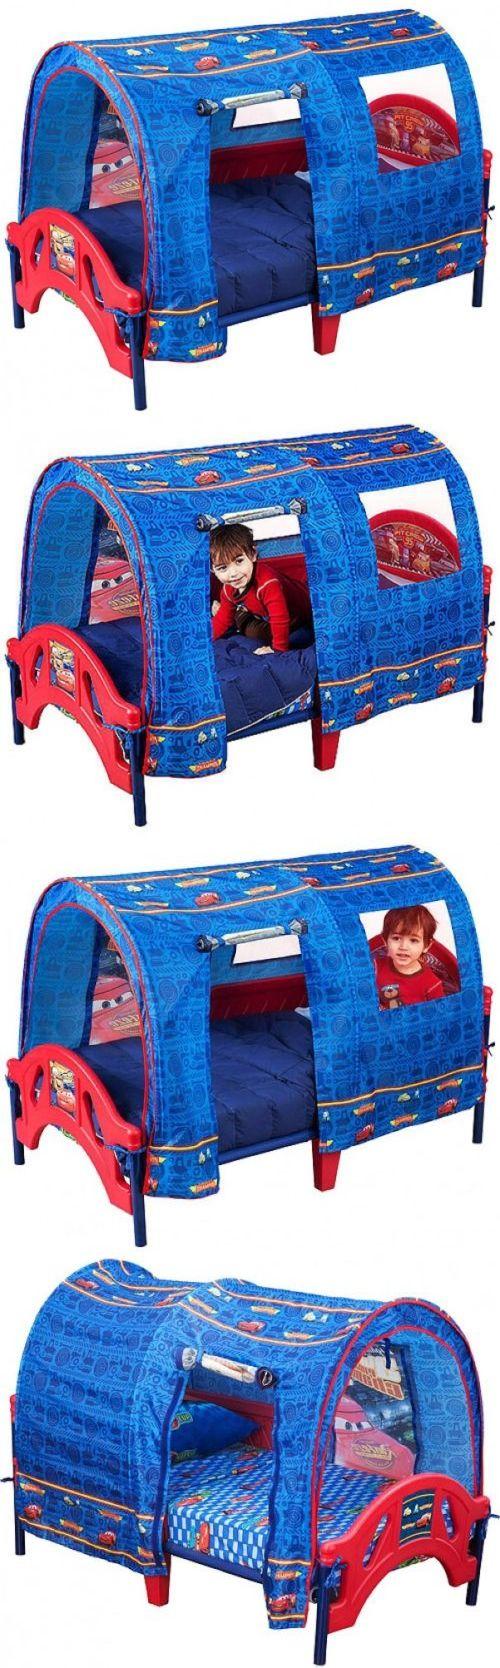 Kids Furniture: Disney Cars Lightweight Toddler Canopy Bed Set Kids Bedroom  Furniture With Tent -